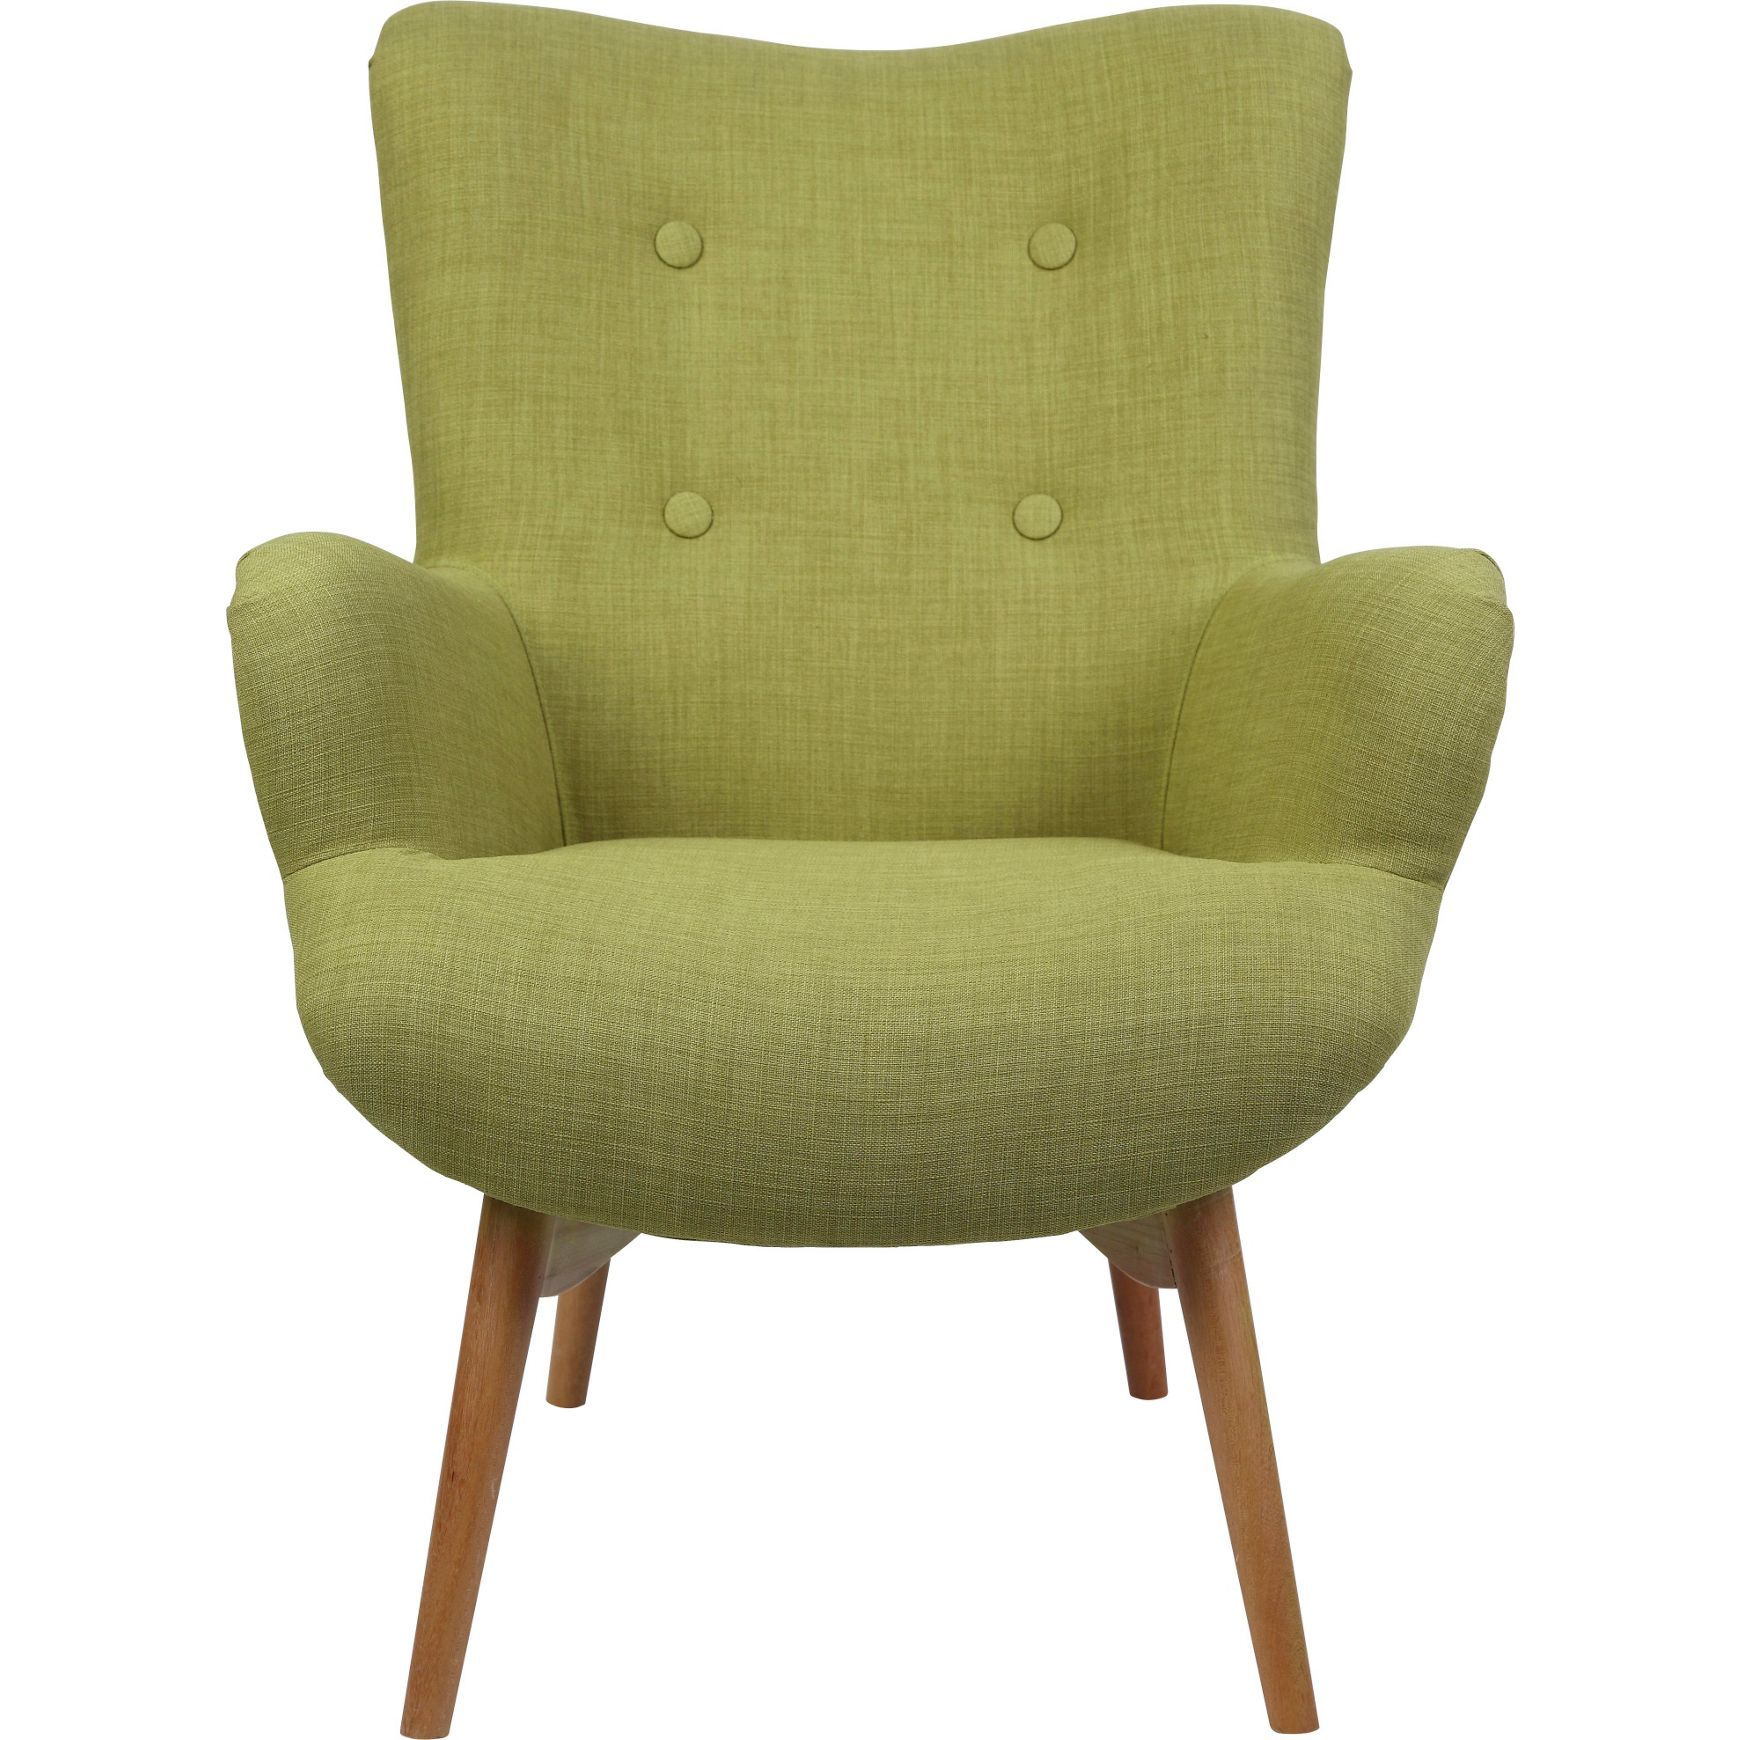 SESSEL in Grün Textil   Sessel, 30 Tag und Grün